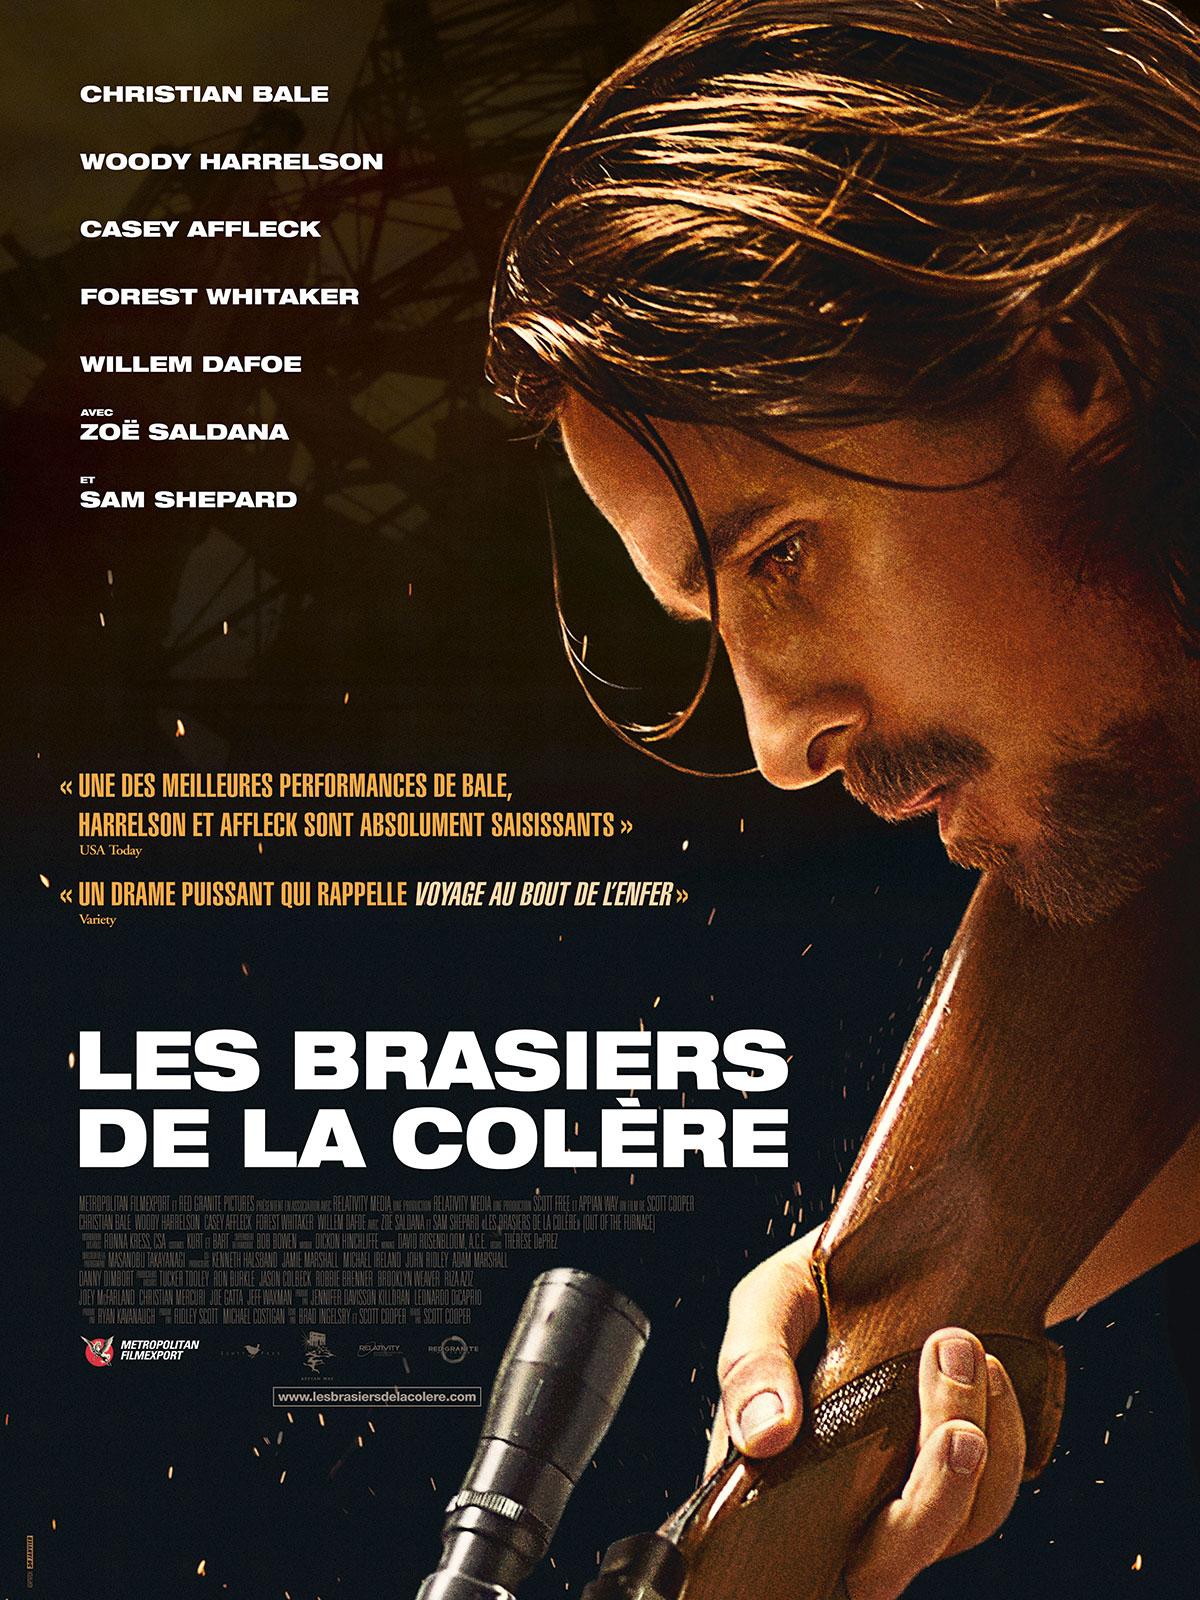 http://fr.web.img4.acsta.net/pictures/13/12/17/13/08/318843.jpg